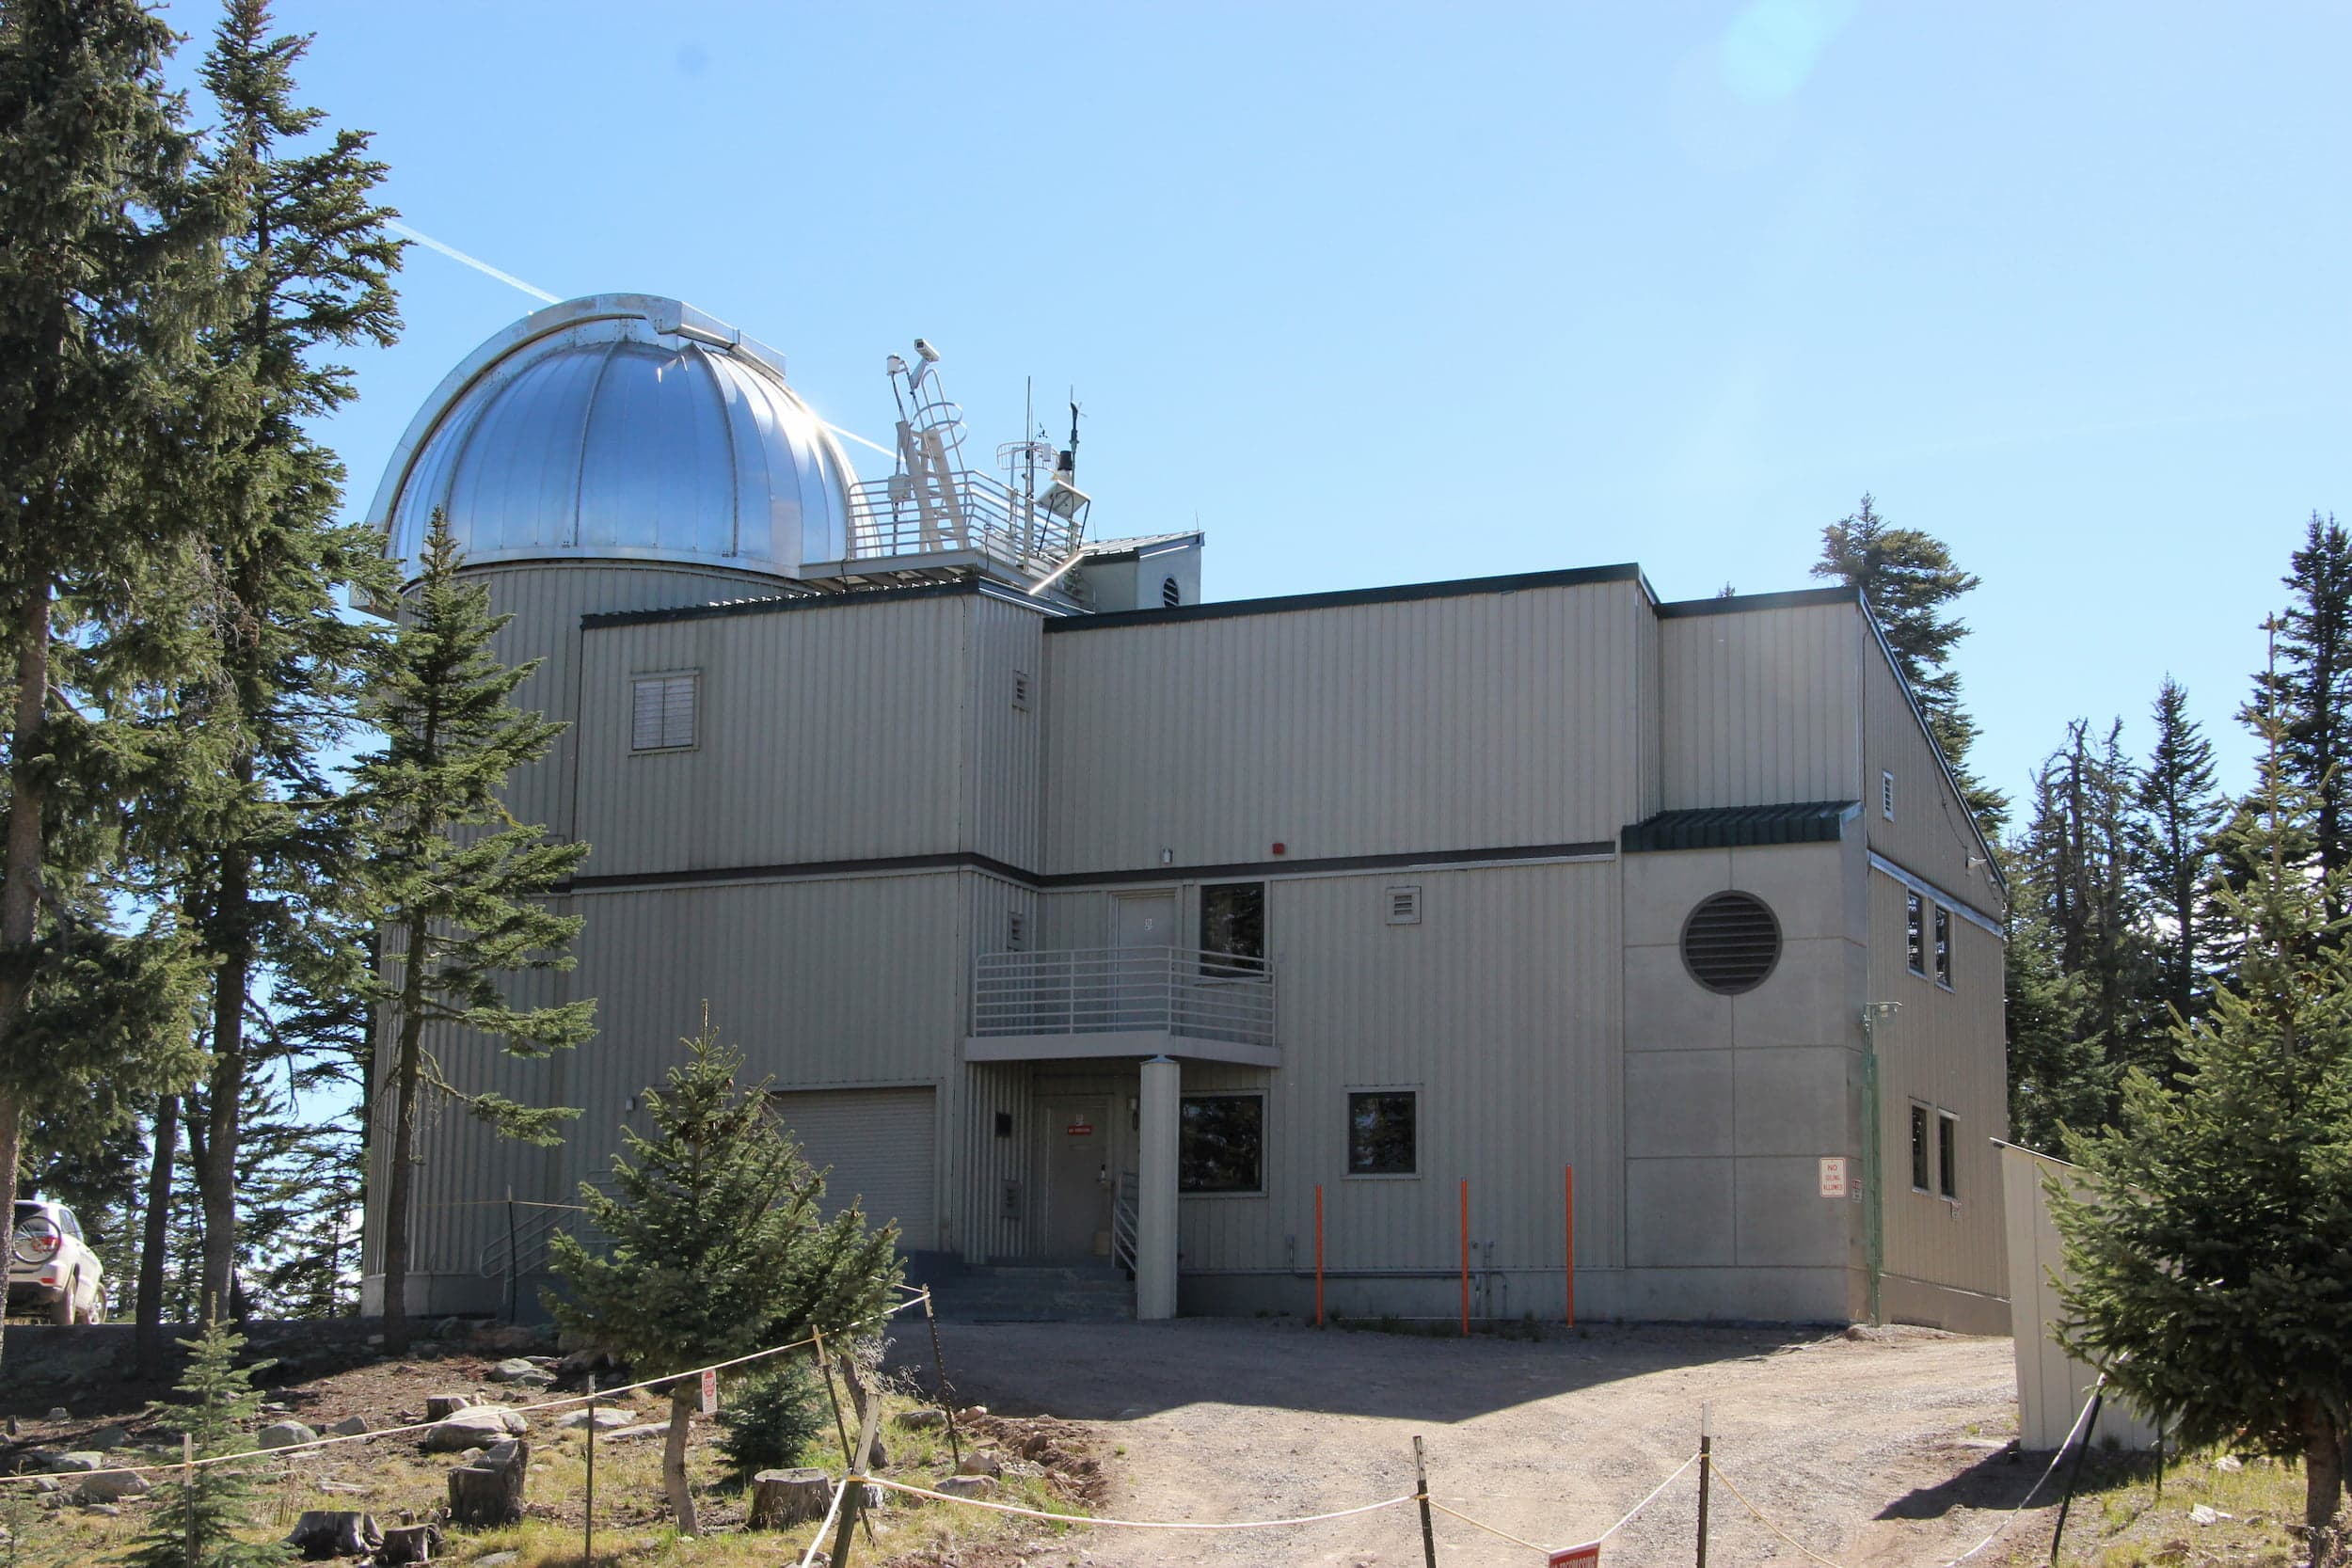 Vatican Observatory Telescope Exterior